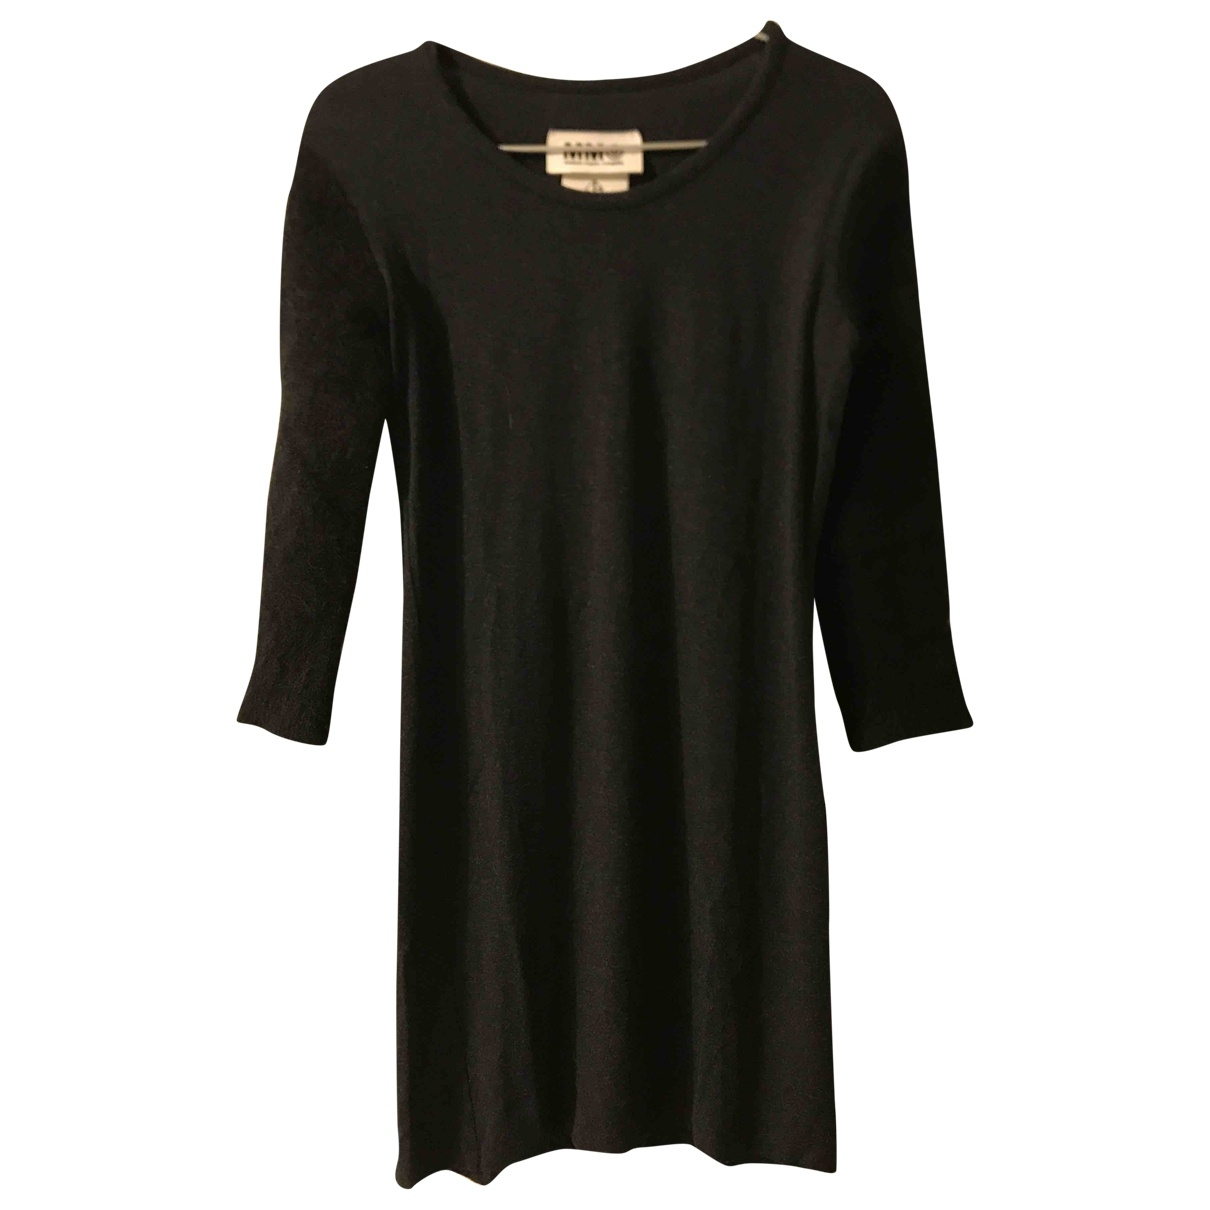 Mm6 \N Black Cotton dress for Women M International